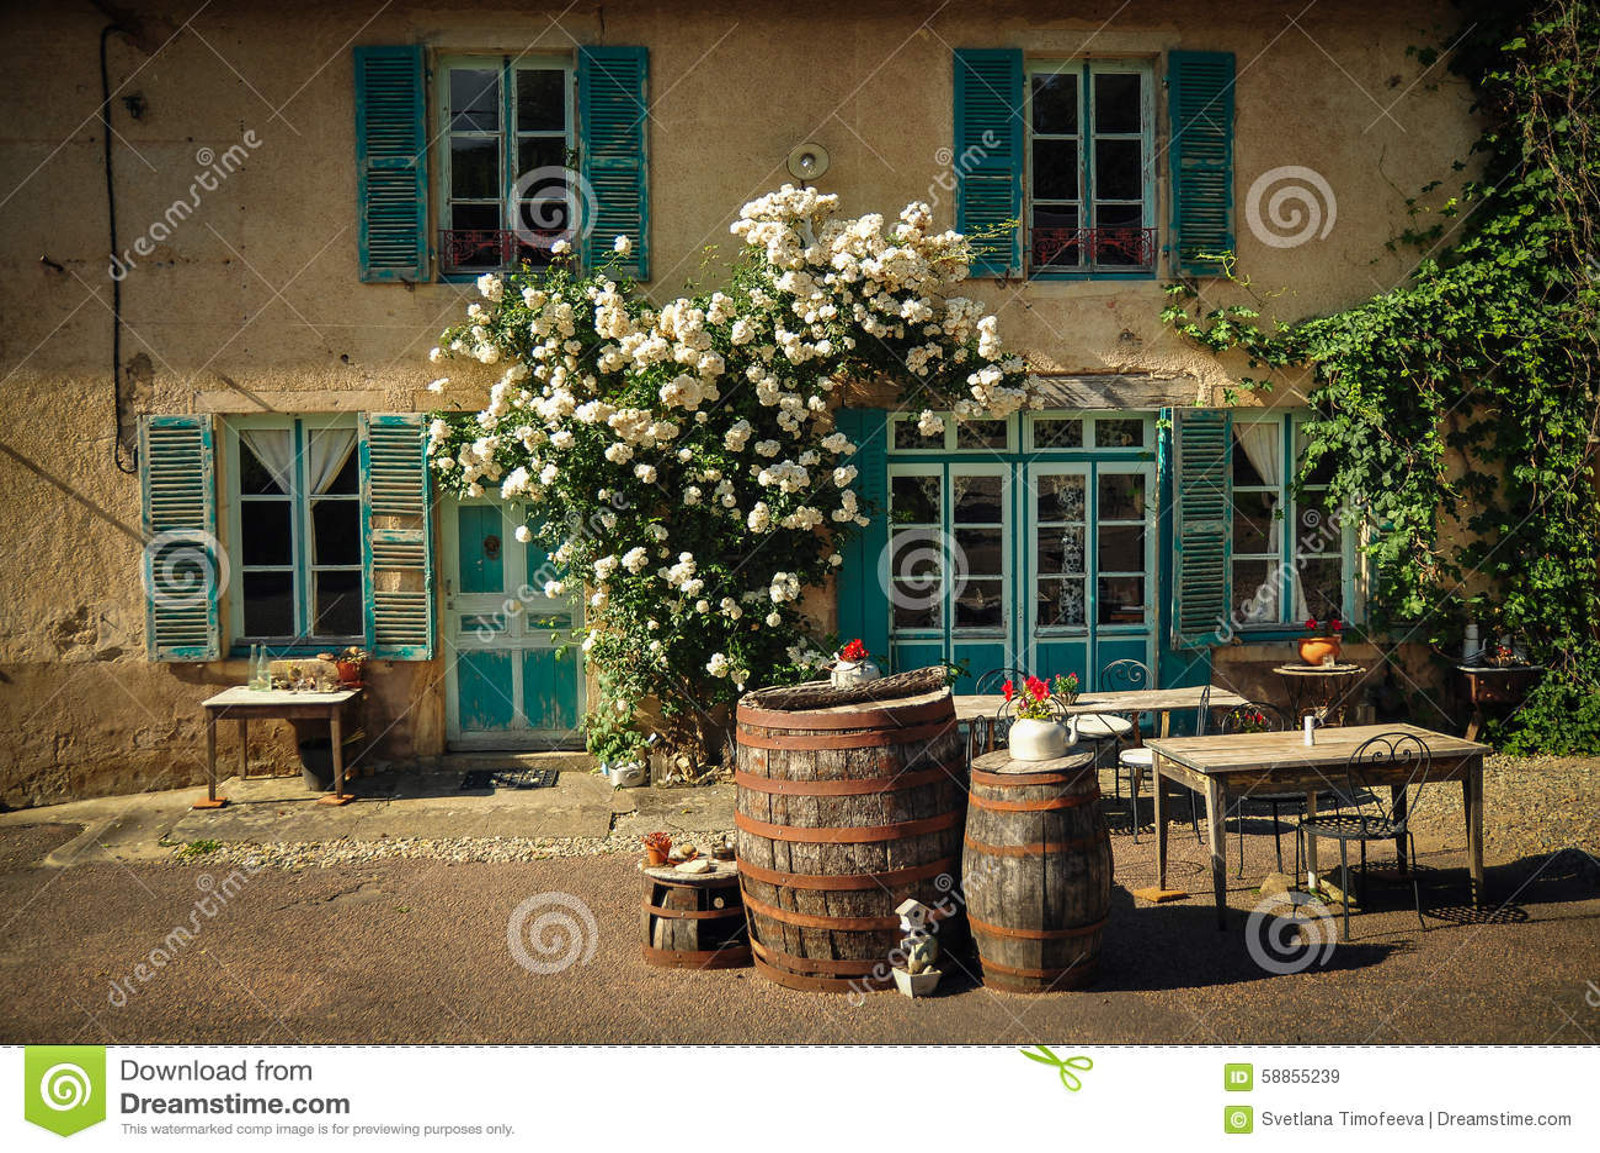 French Maison